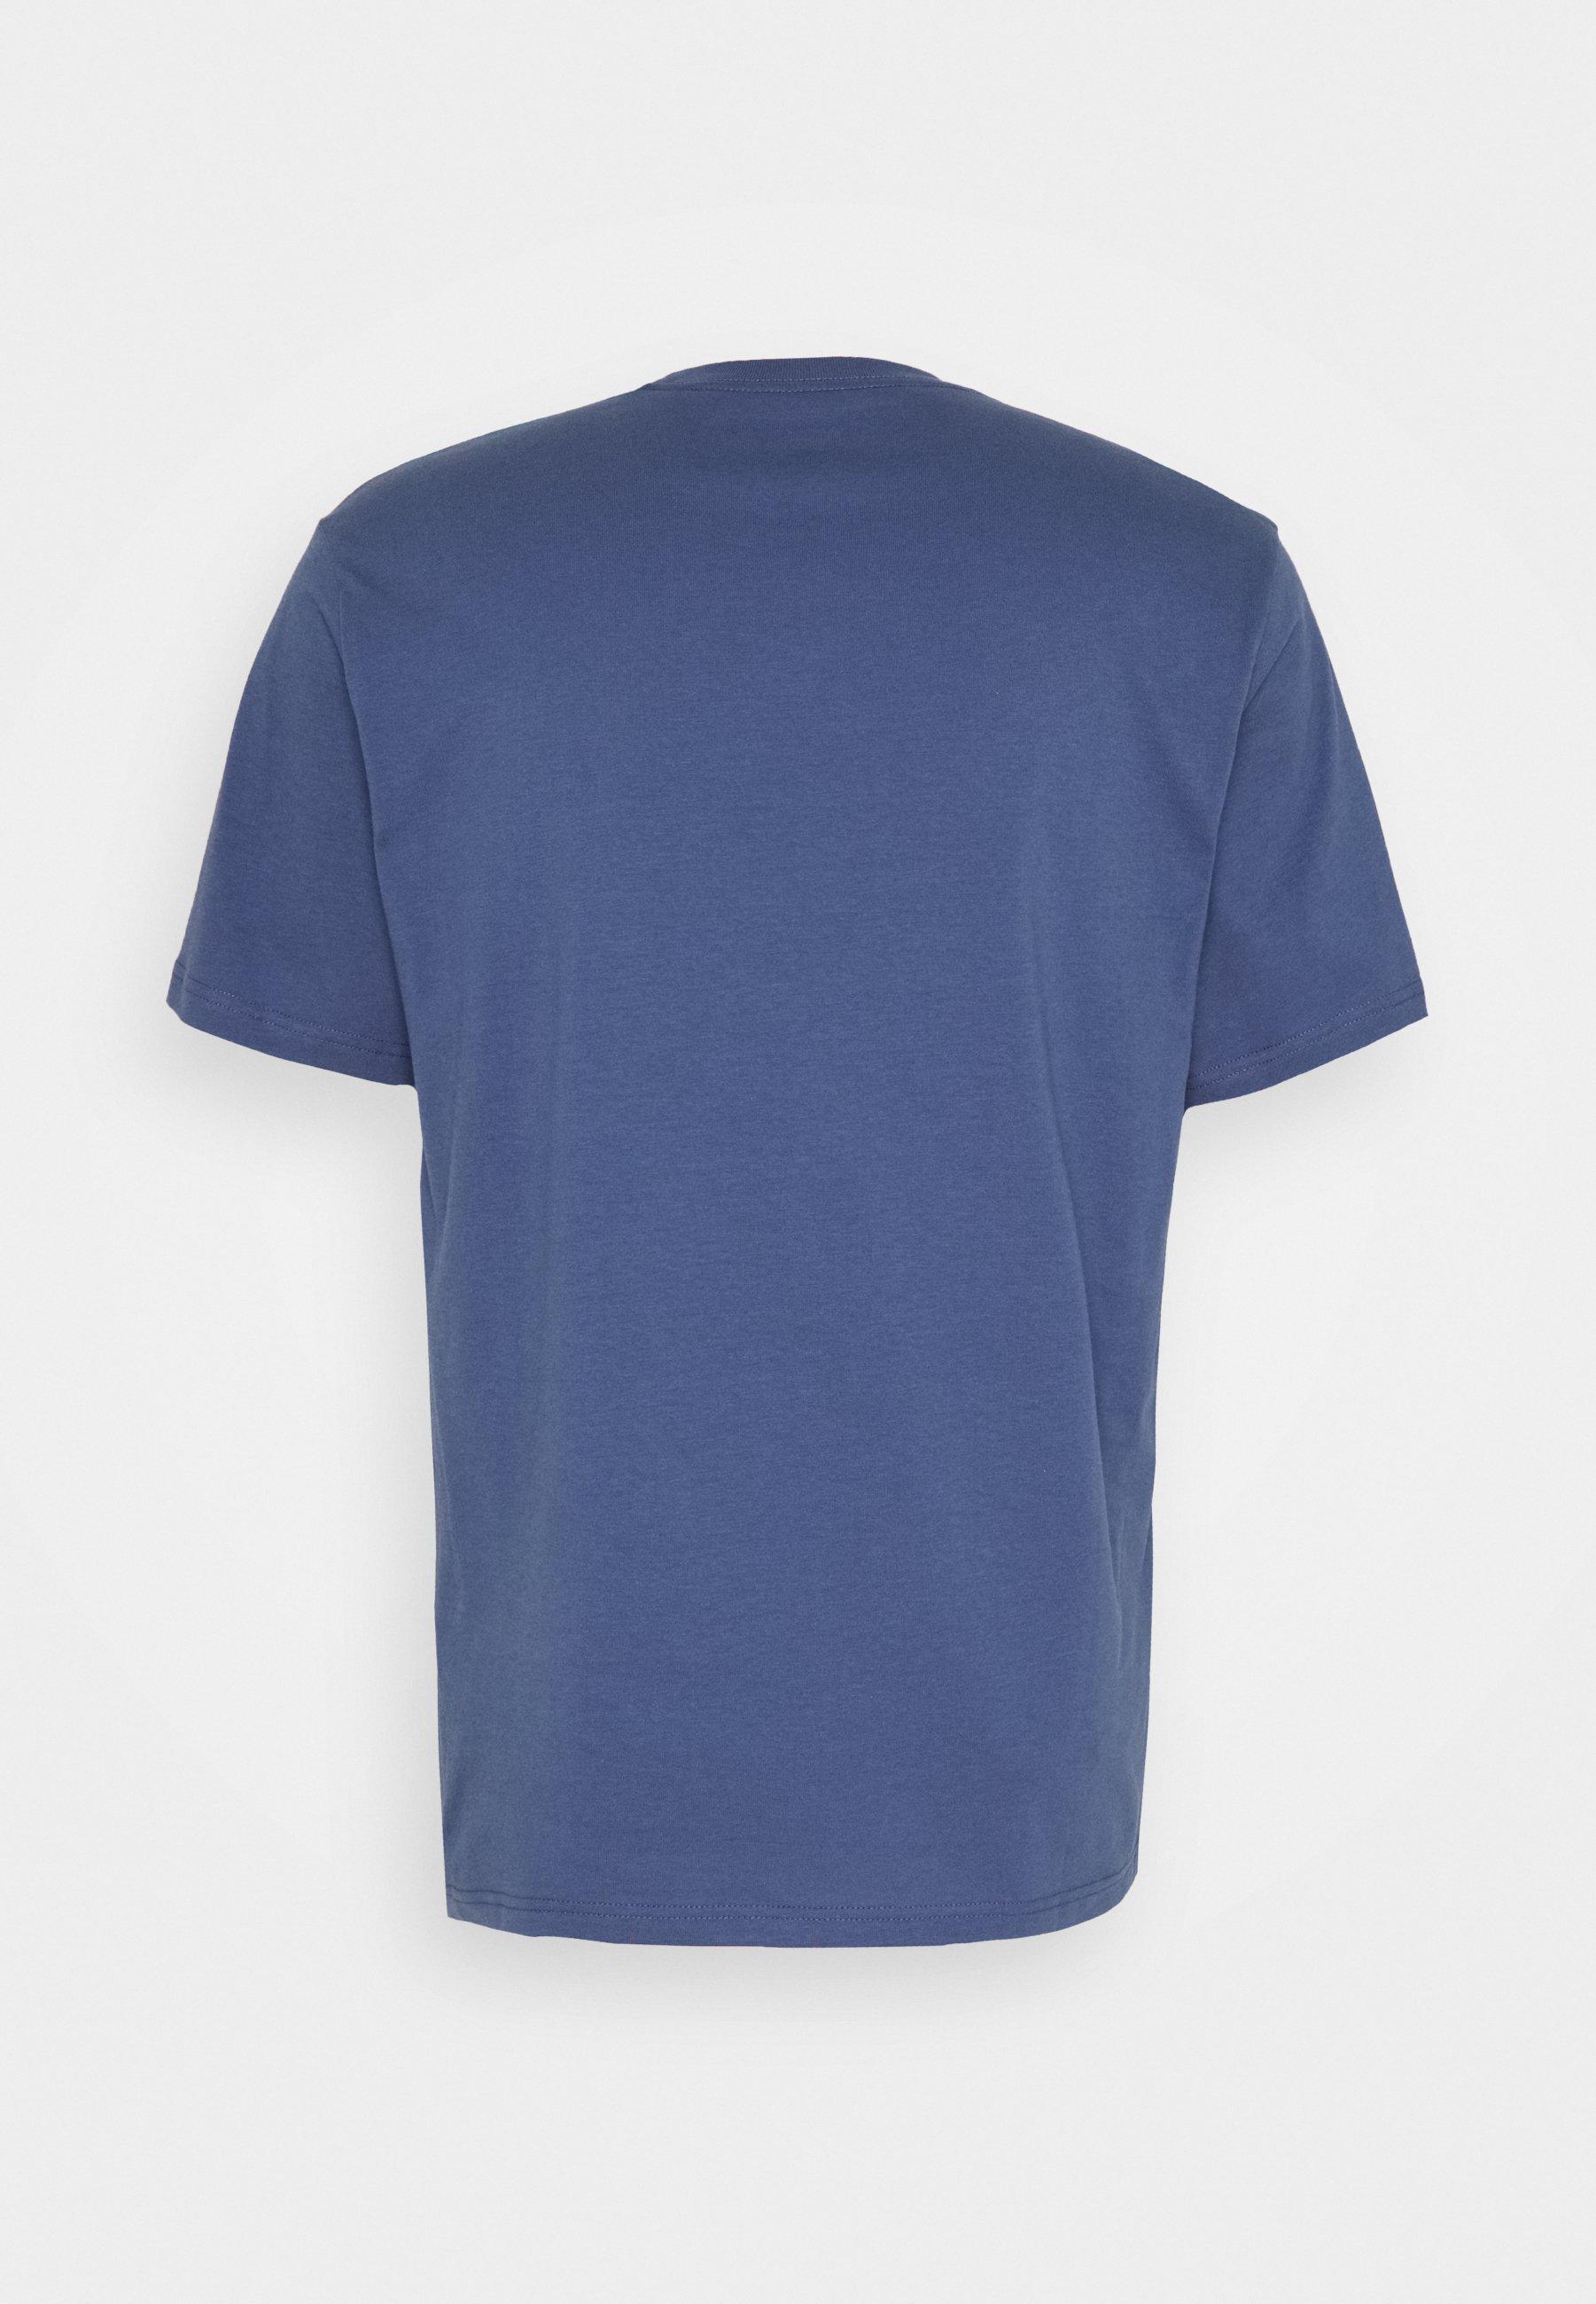 Levi's® Tee - T-shirts Med Print Blue Indigo/mørkeblå